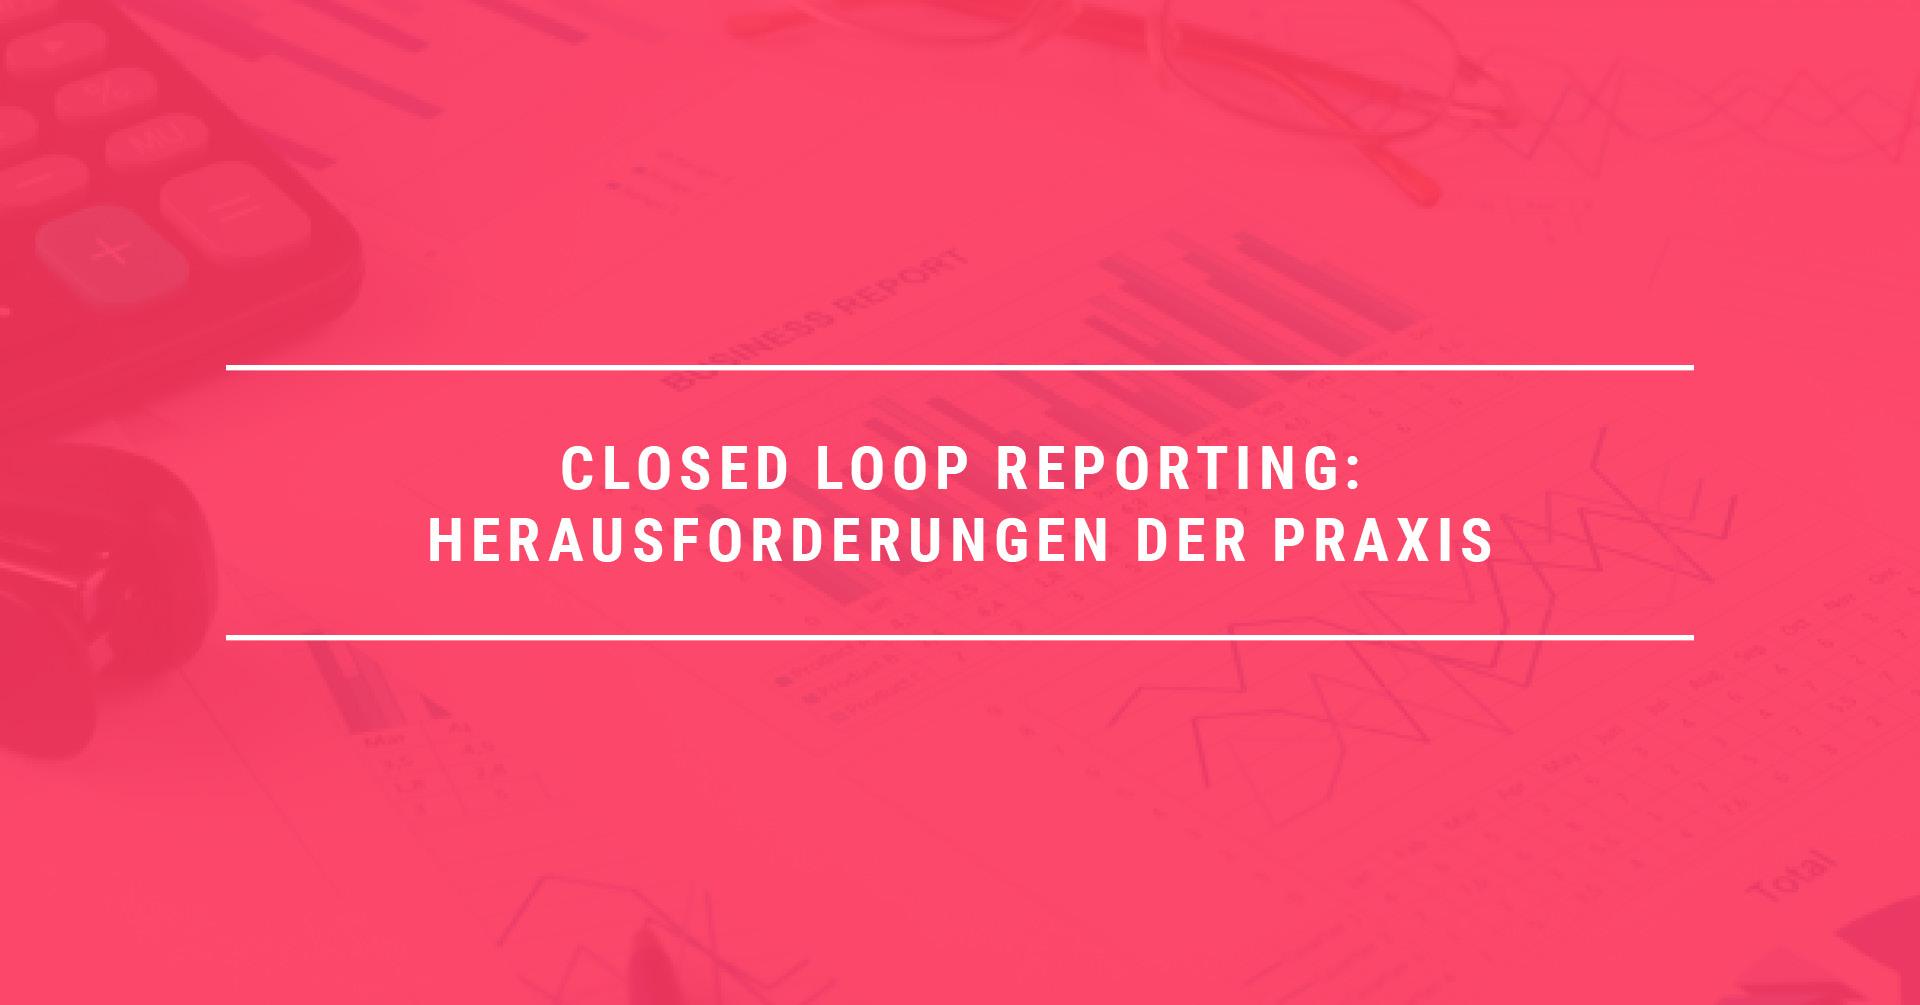 Closed Loop Reporting: Drei Herausforderungen der Praxis meistern